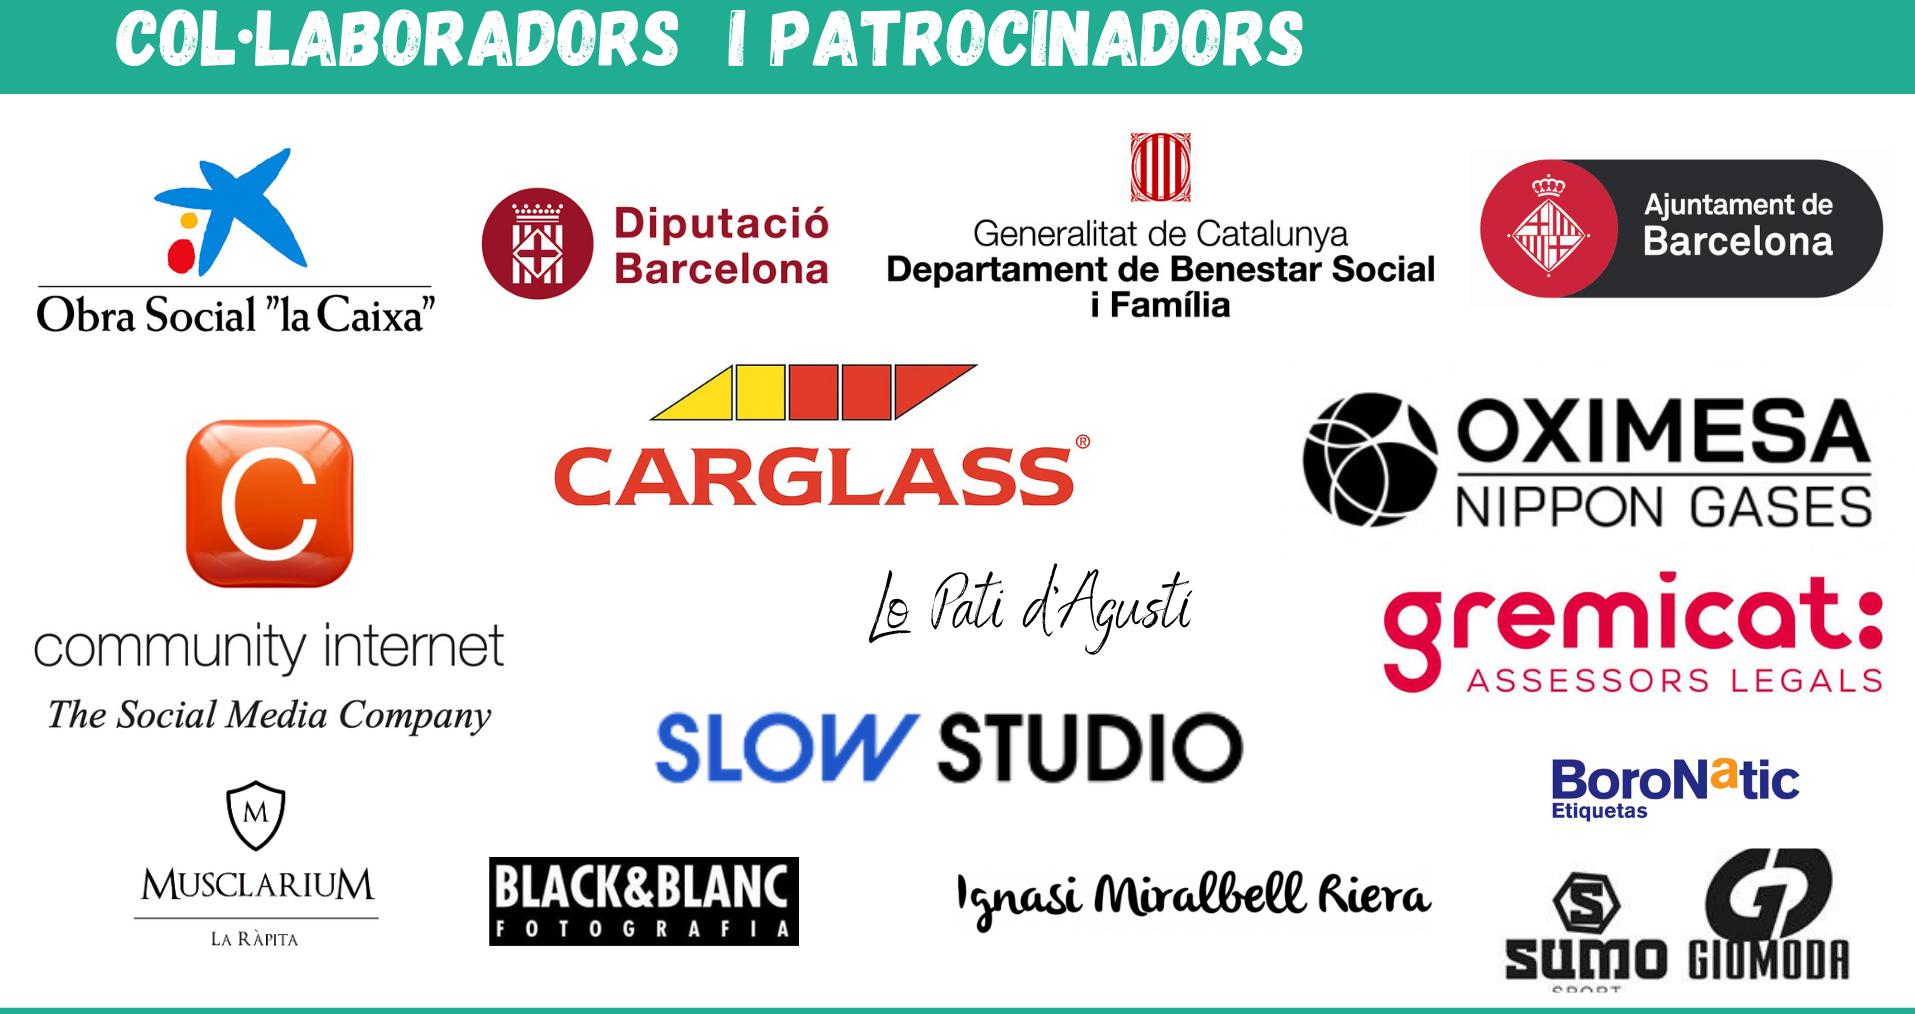 Logos Patrocinadors i col.laboradors la finestra AIS ajuda Delta